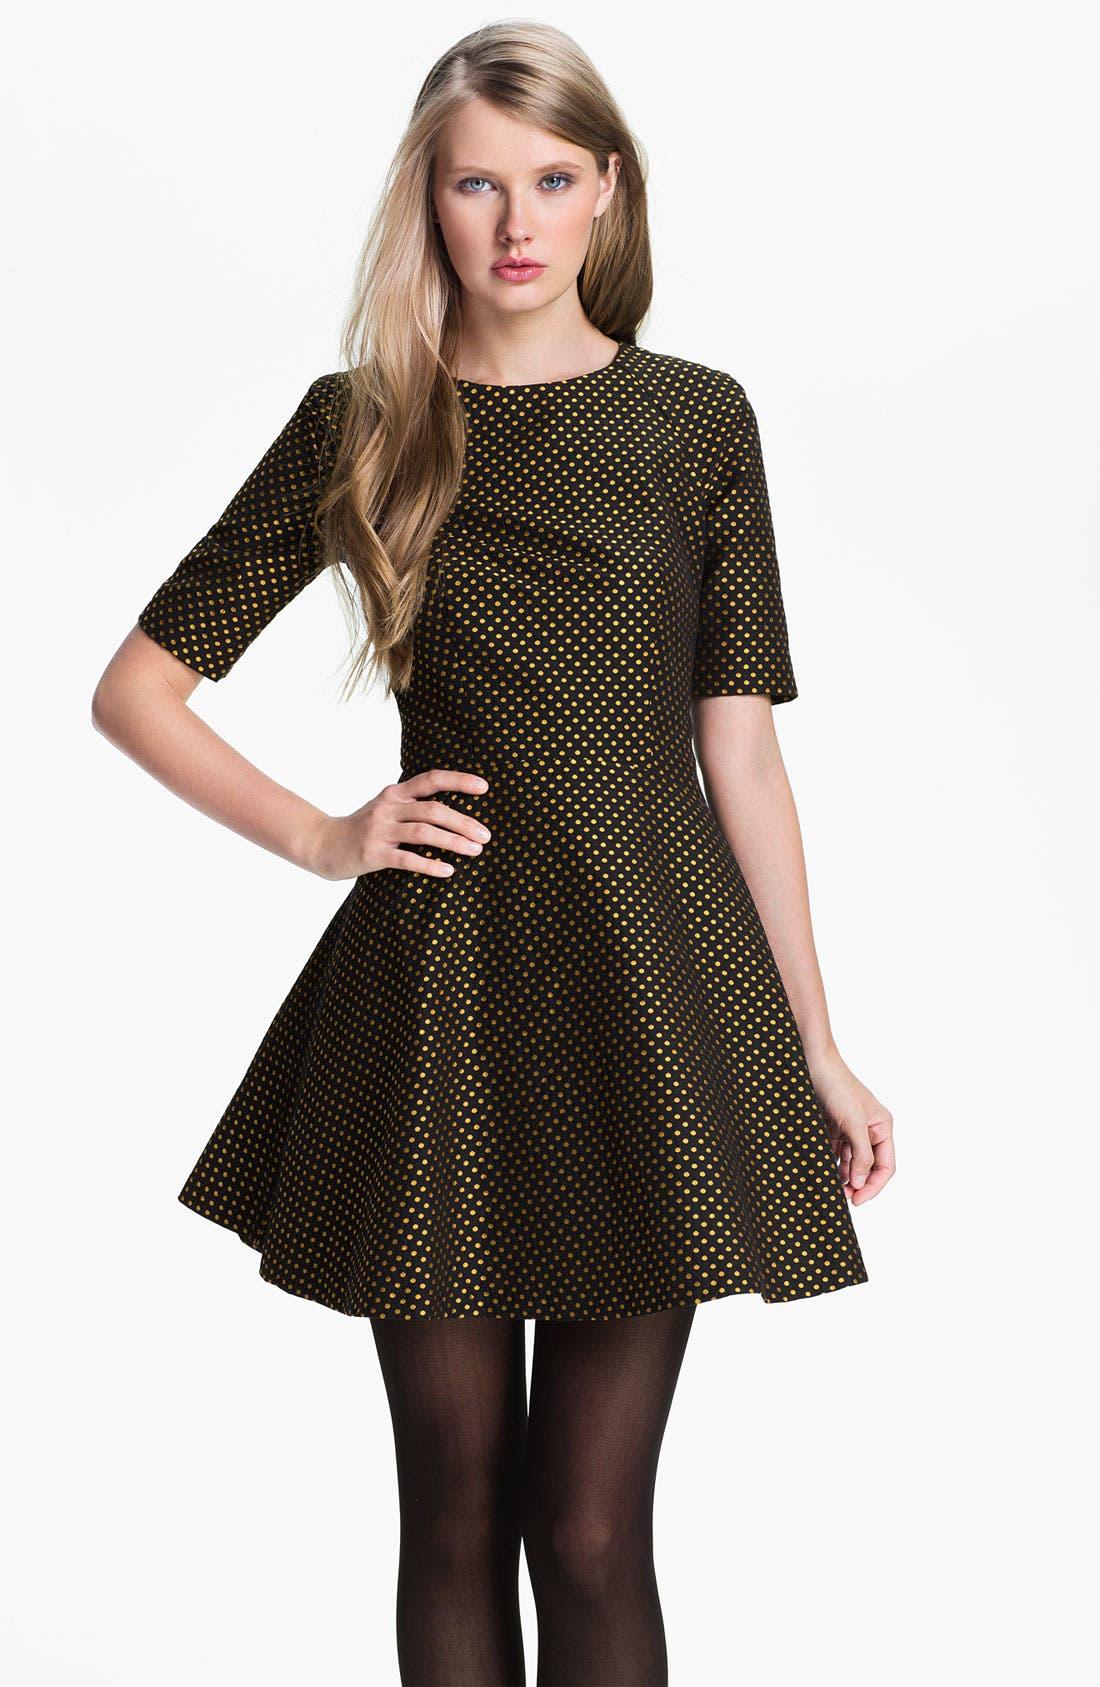 Alternate Image 1 Selected - Ted Baker London Jacquard Fit & Flare Dress